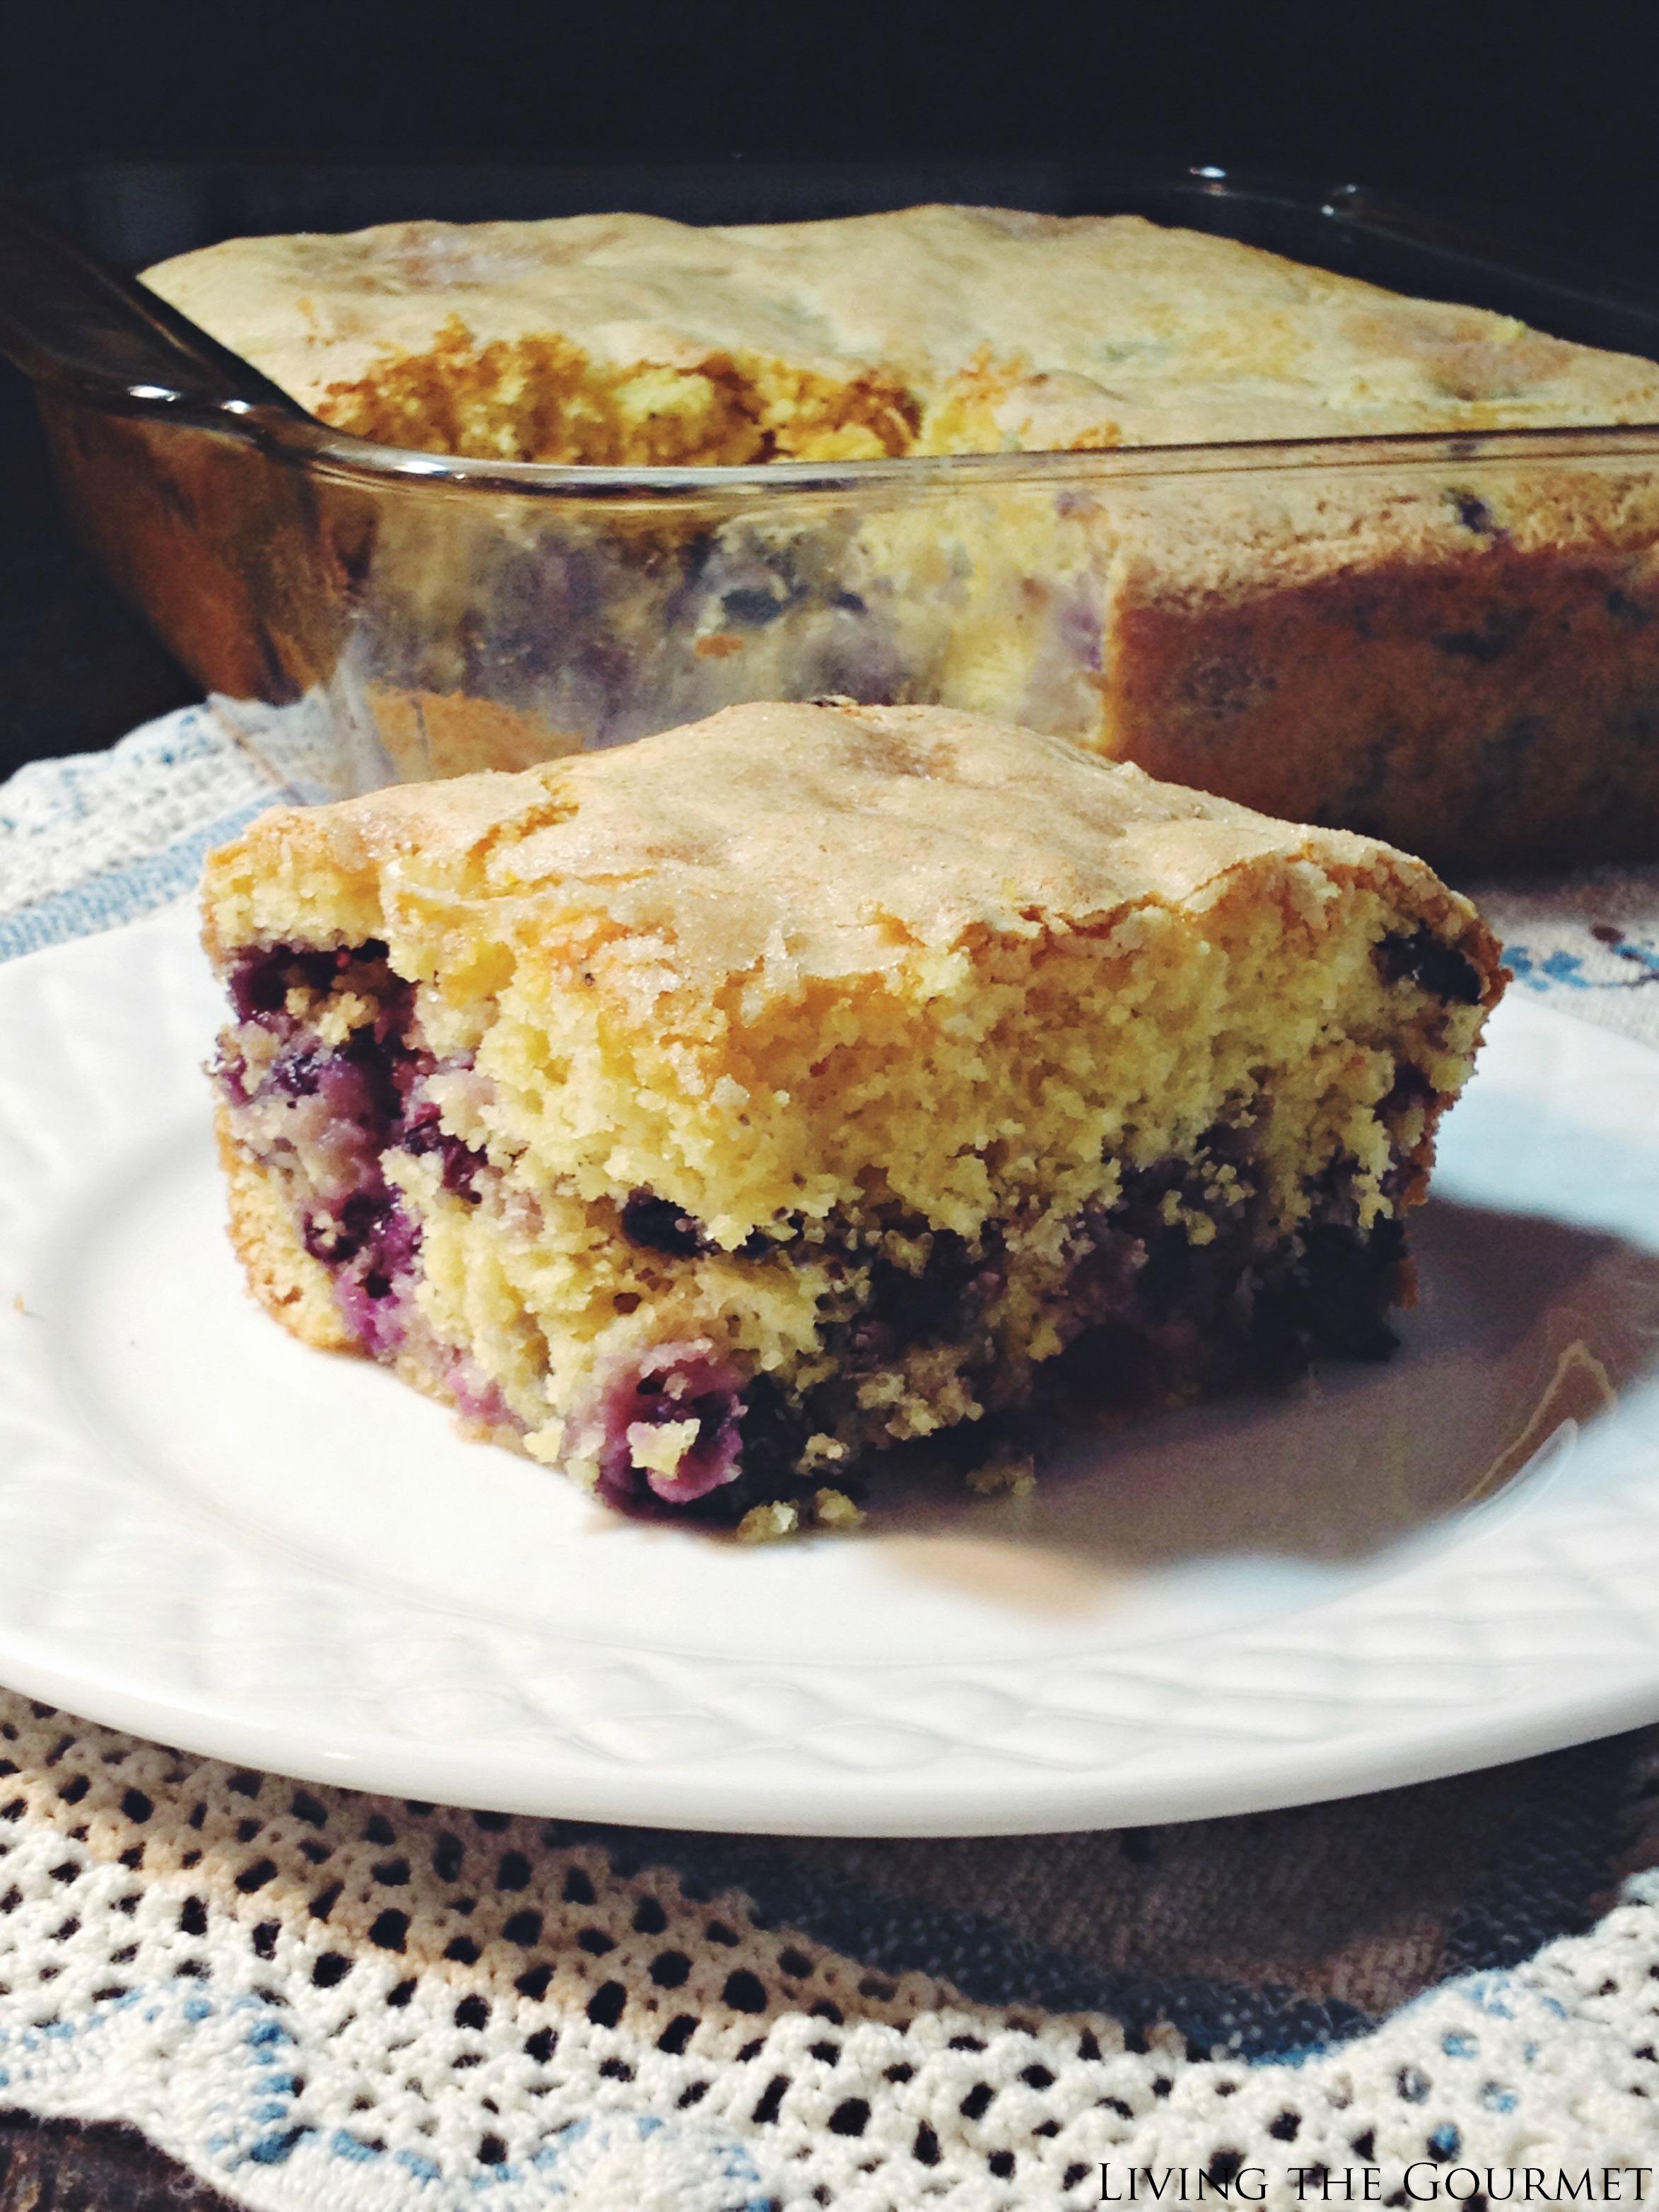 Living the Gourmet: Buttermilk Blueberry Breakfast Cake